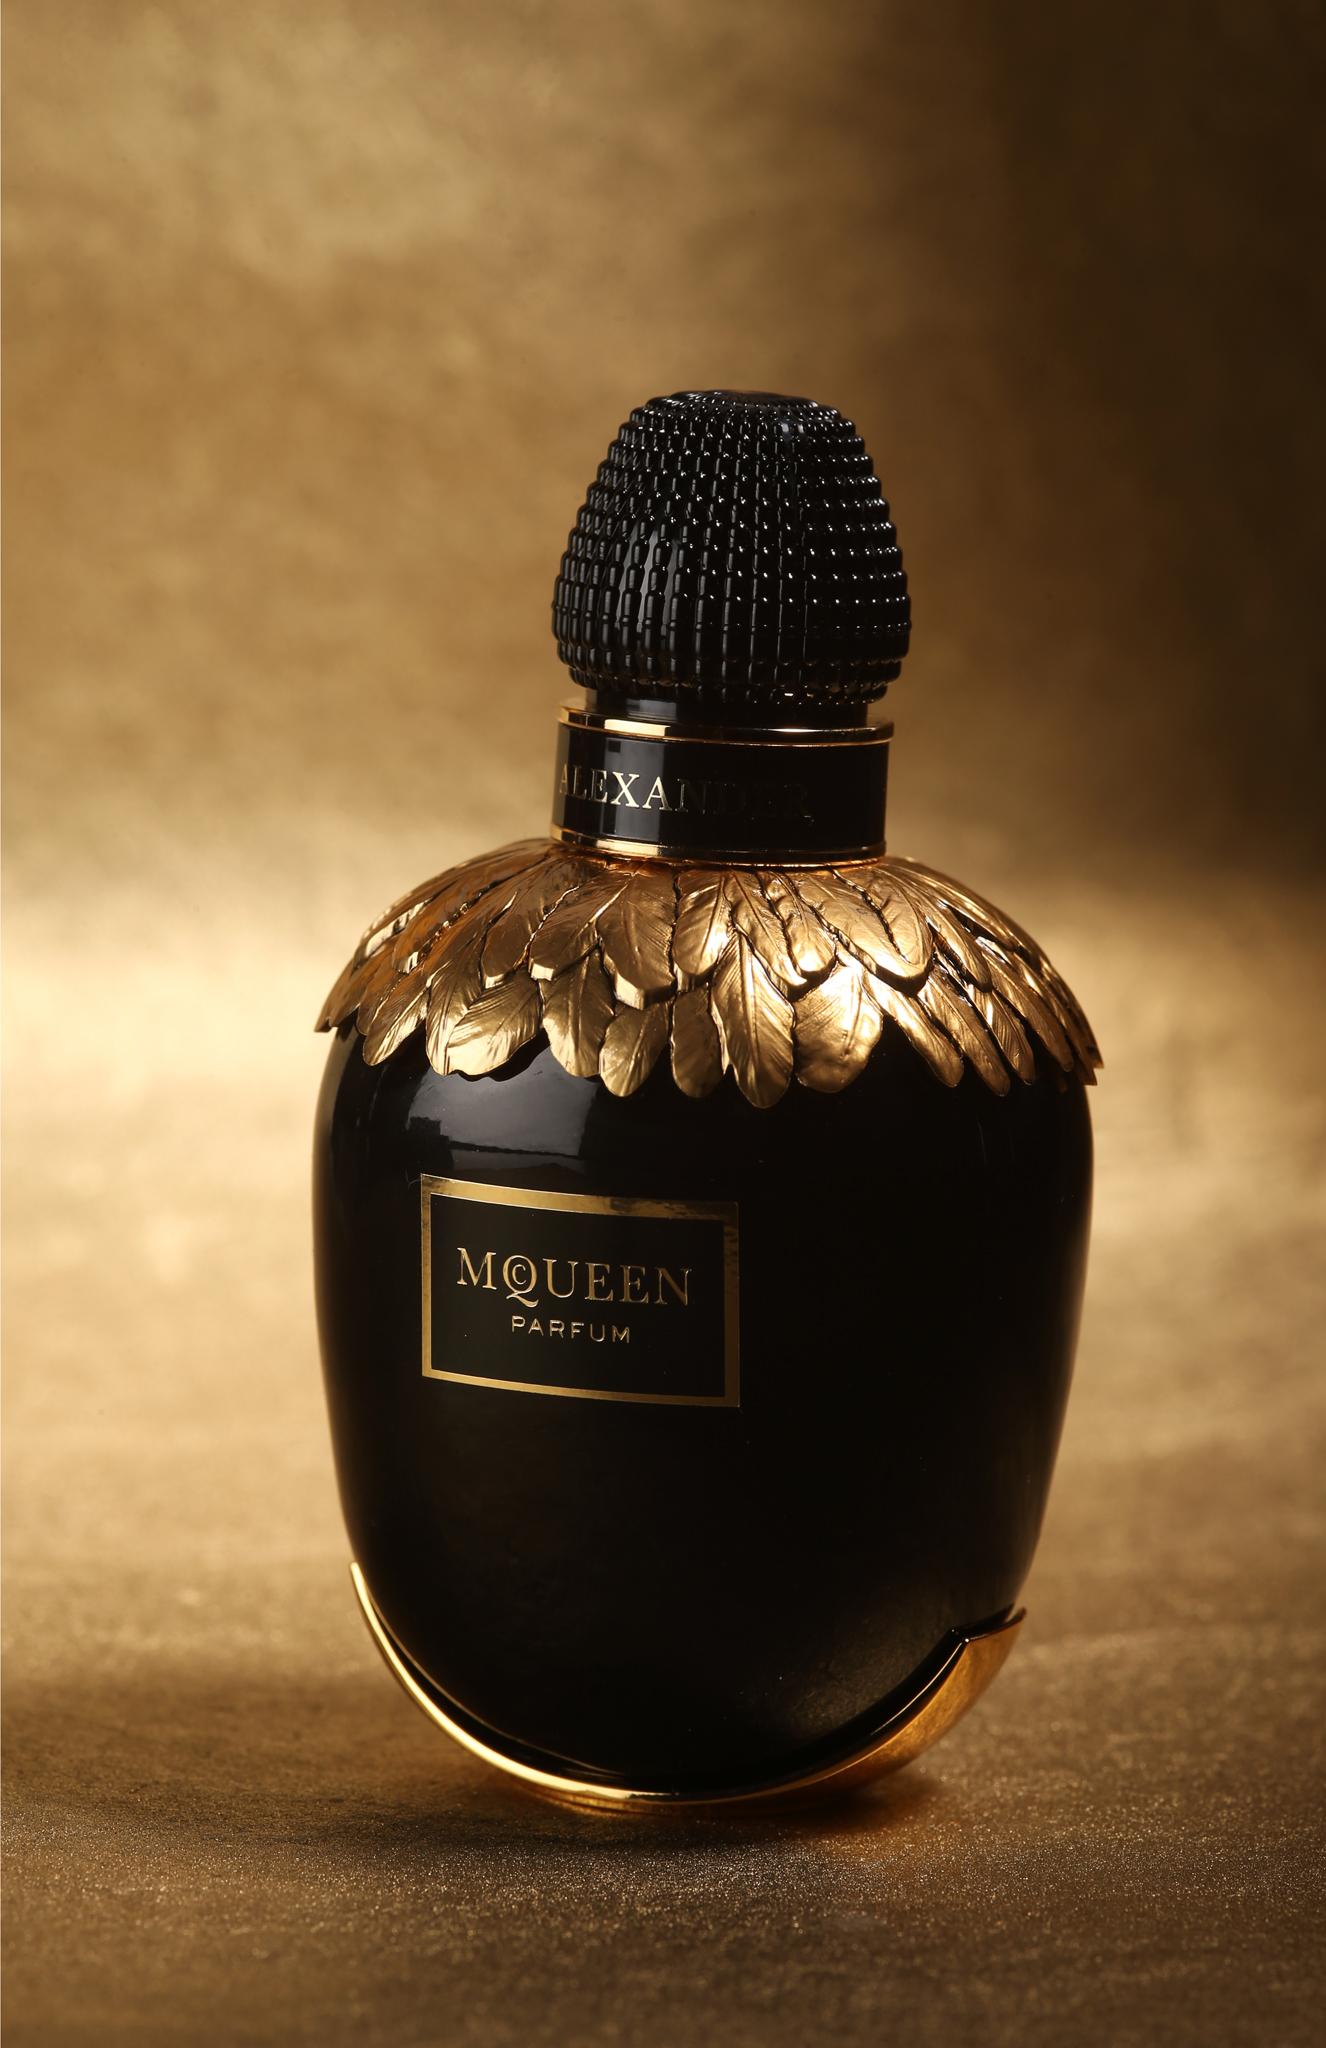 Mcqueen Perfume fragrance